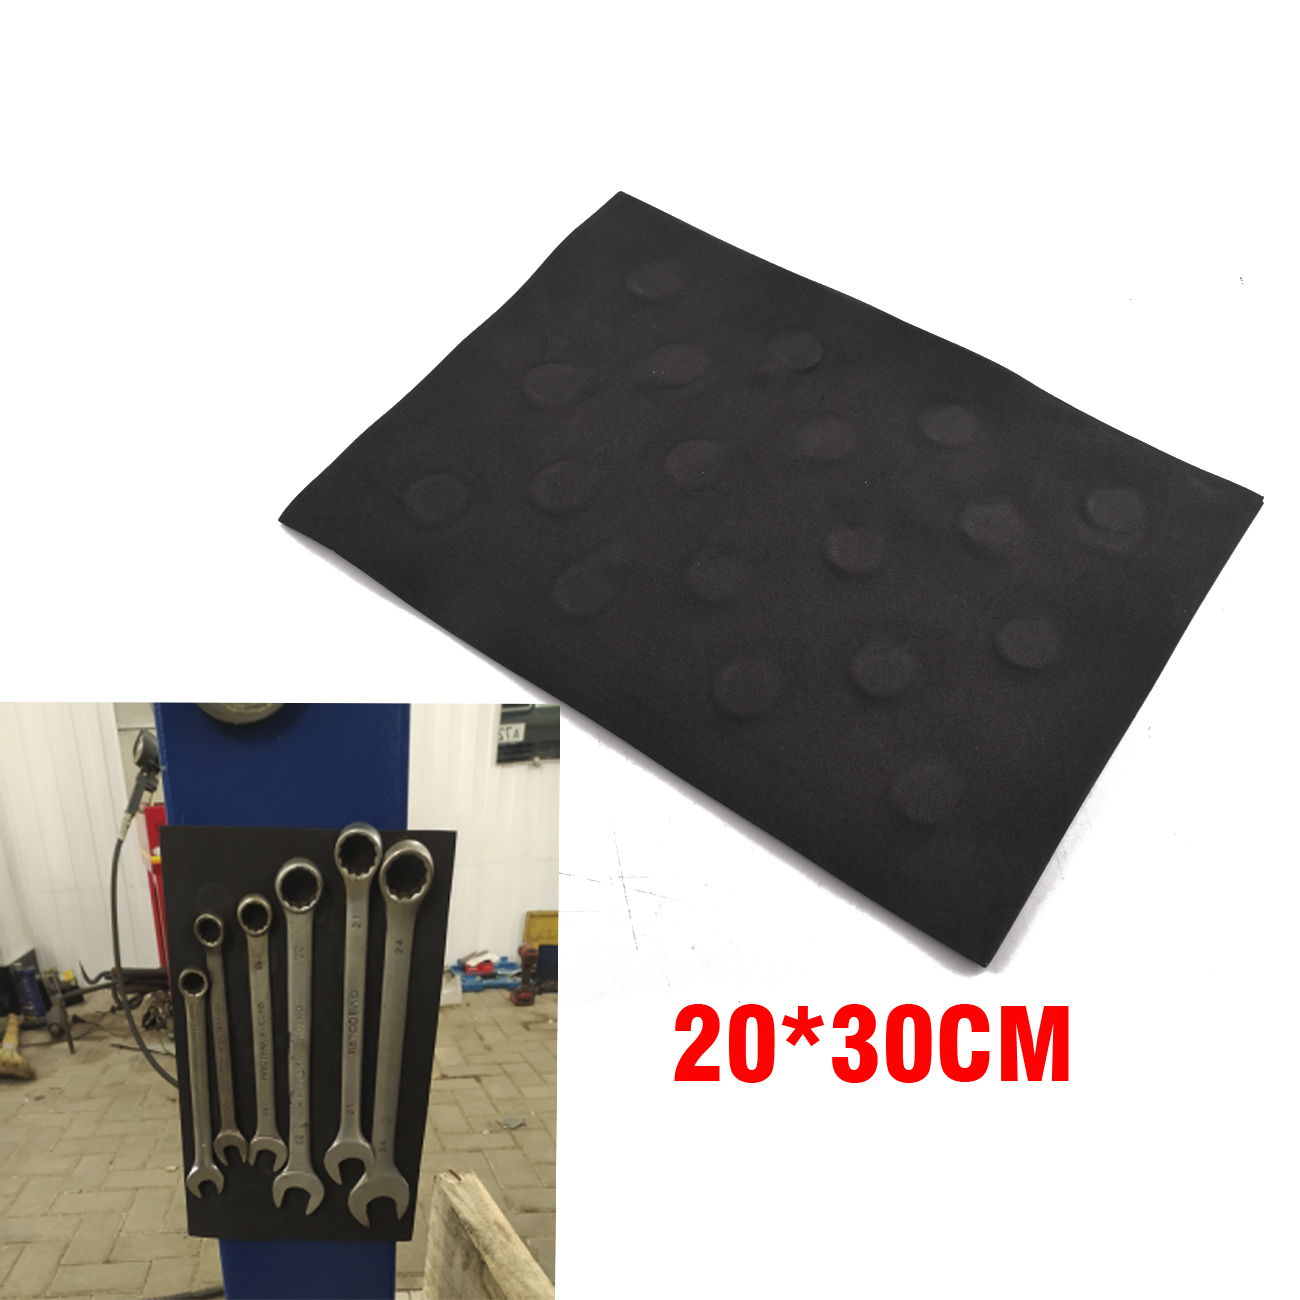 Mag Pad Repair Tools Accessories Mag-Pad Magnetic Pad Hold Tool Dropshipping